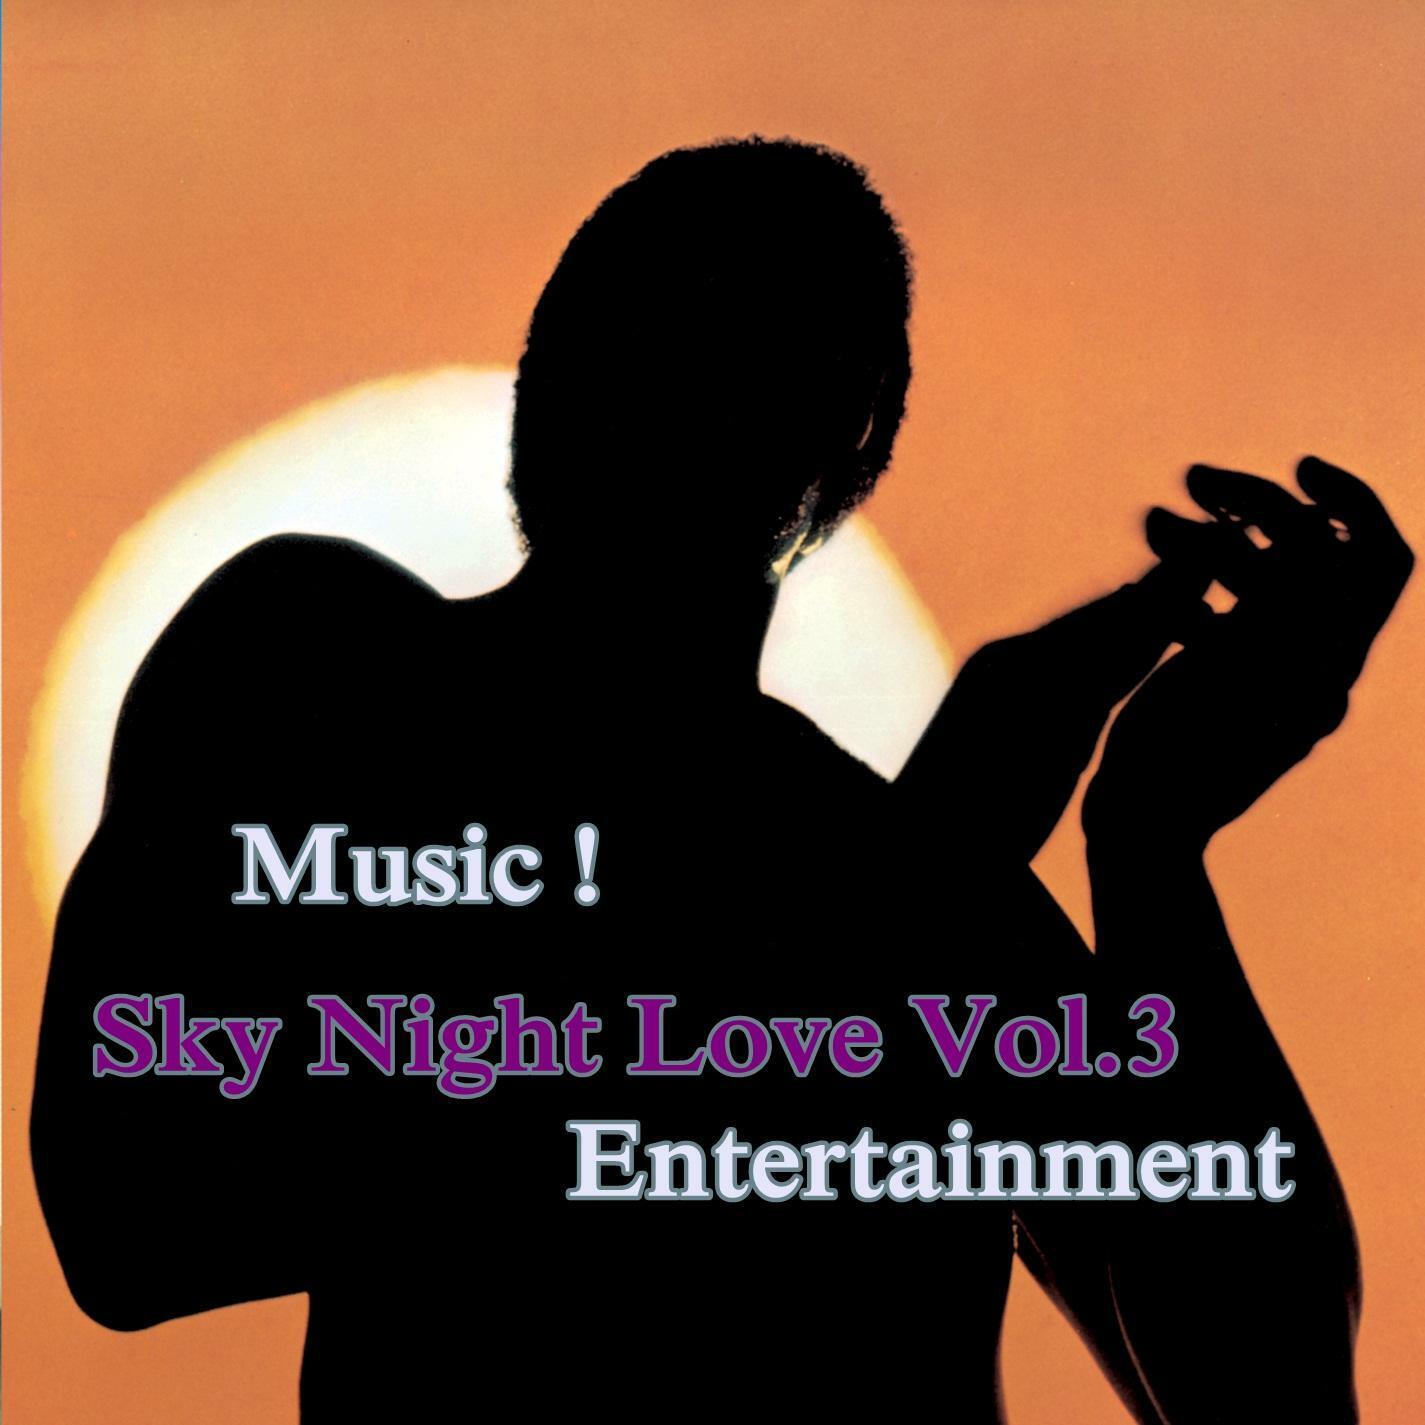 Dem Ngay Xa Em Lyrics listen free to sevensuri - sky night love vol.3 radio on